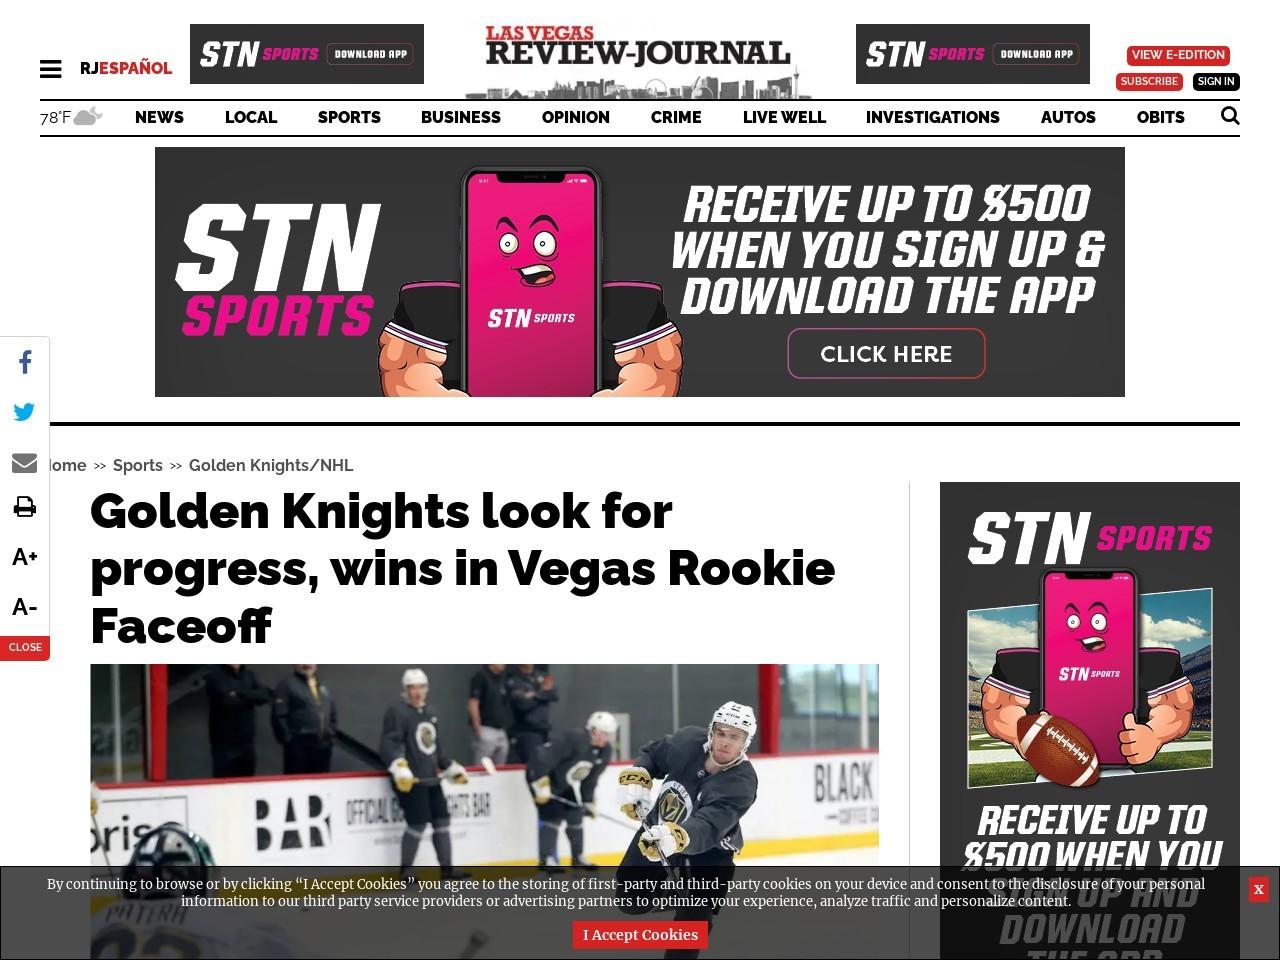 Golden Knights look for progress, wins in Vegas Rookie Faceoff